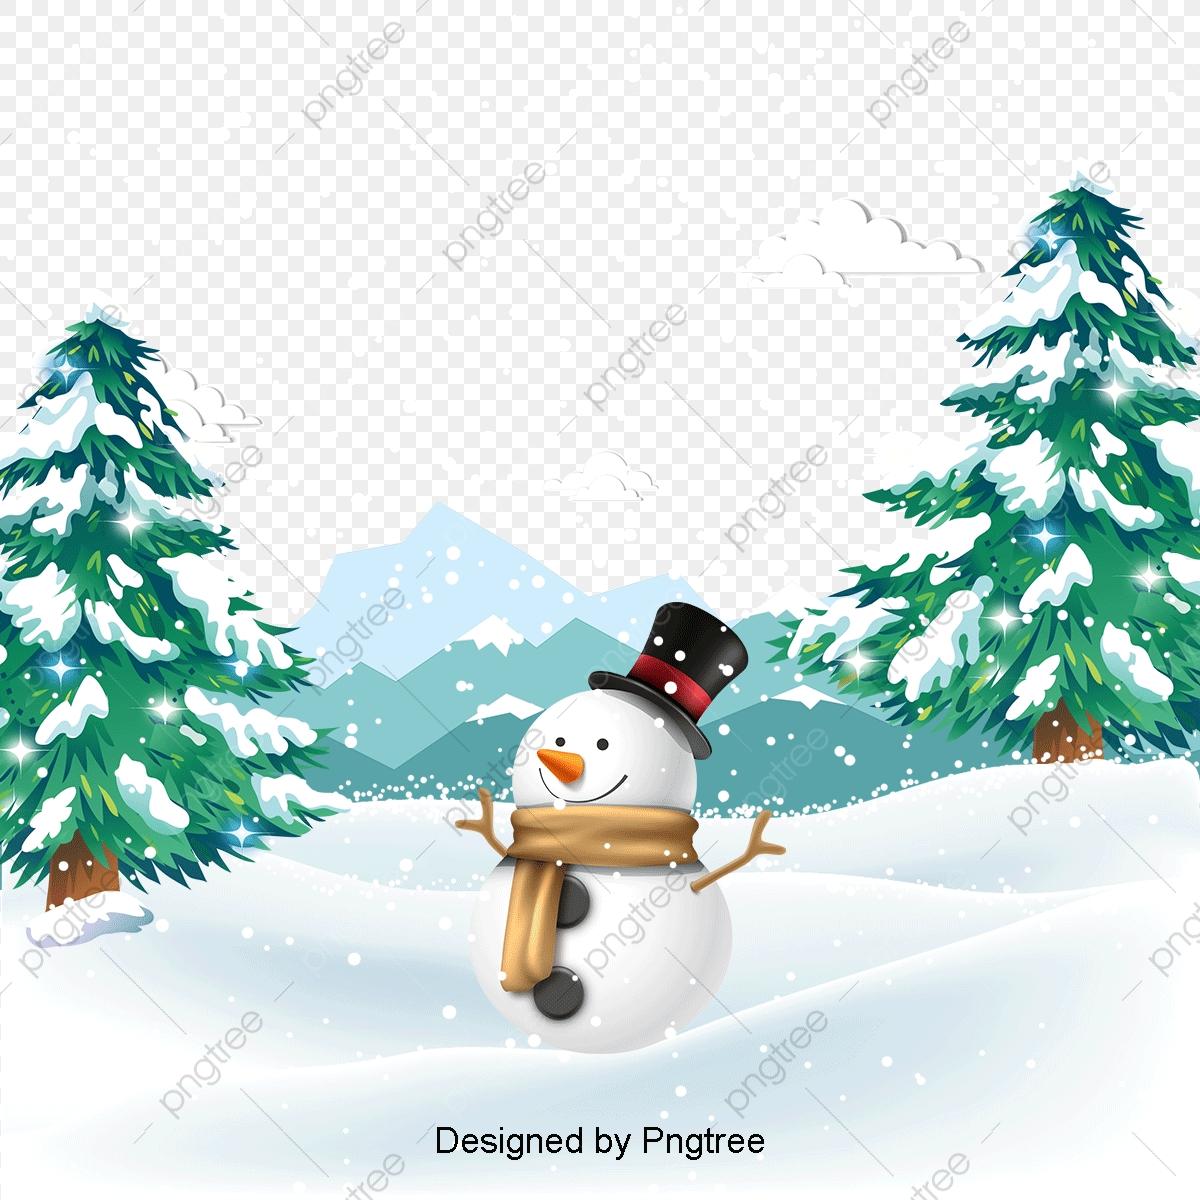 Design Der Schone Schnee Elemente Fur Gebaude Gebaude Snow View